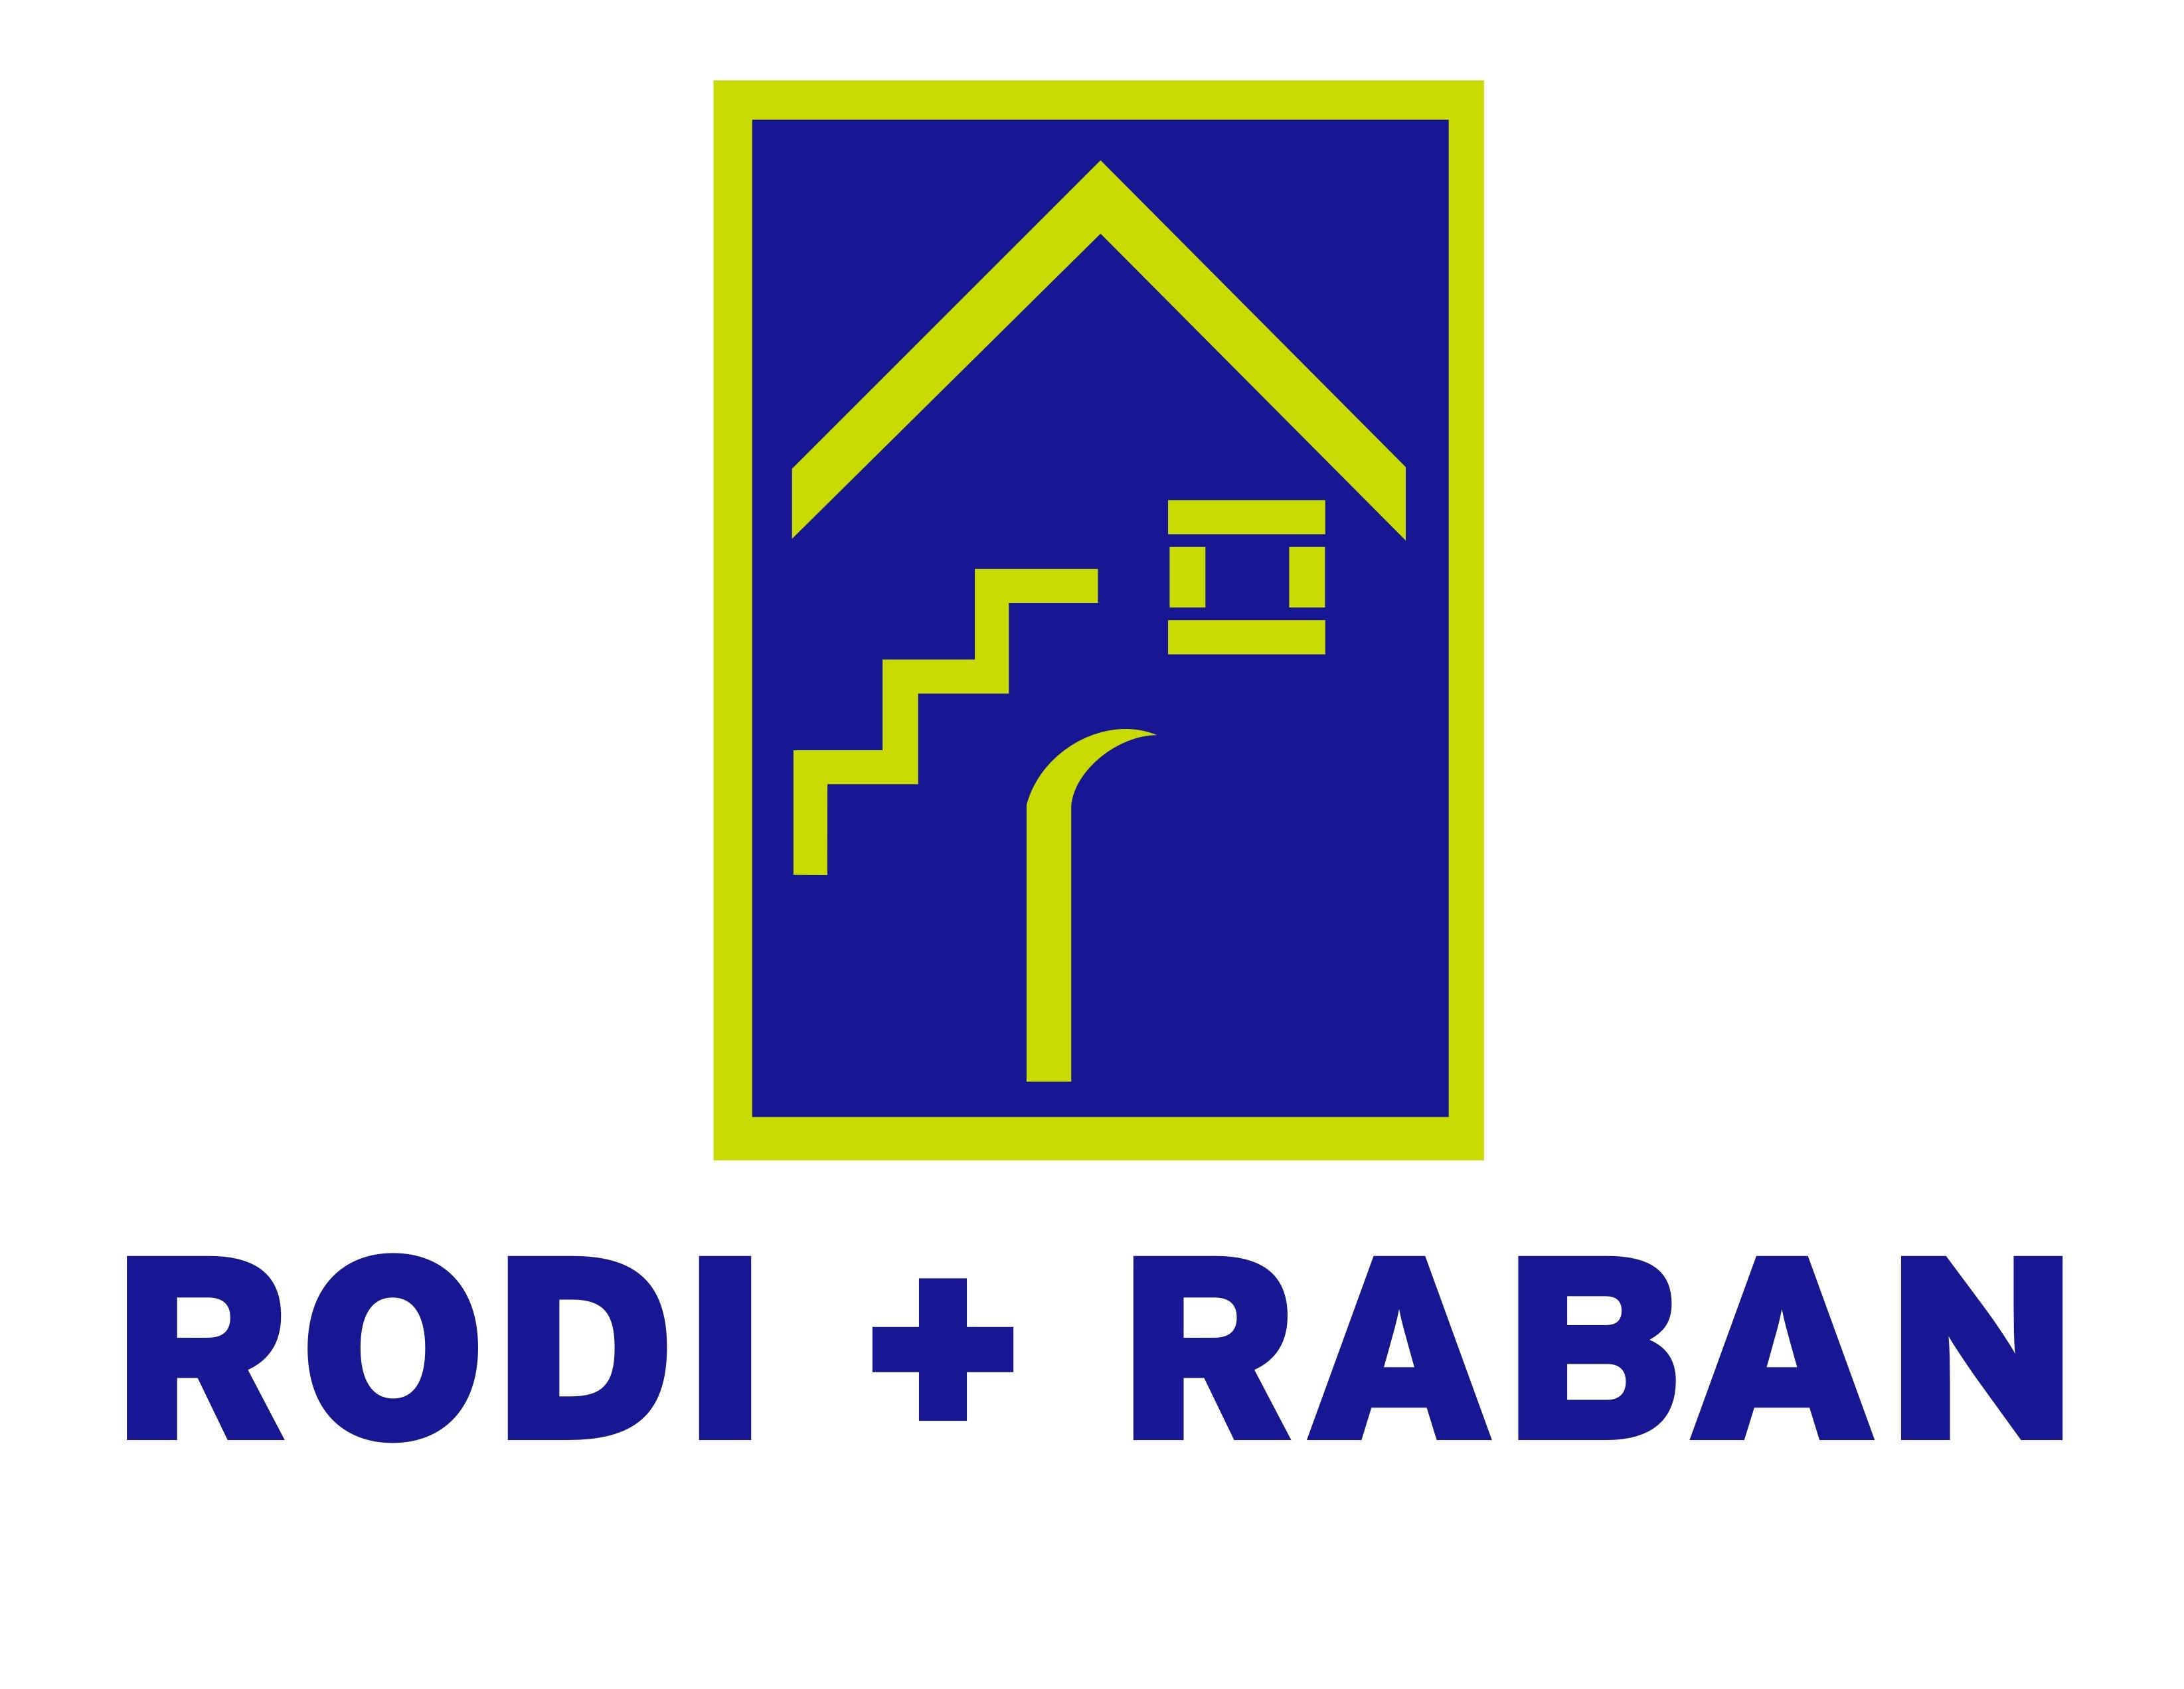 Rodi + Raban